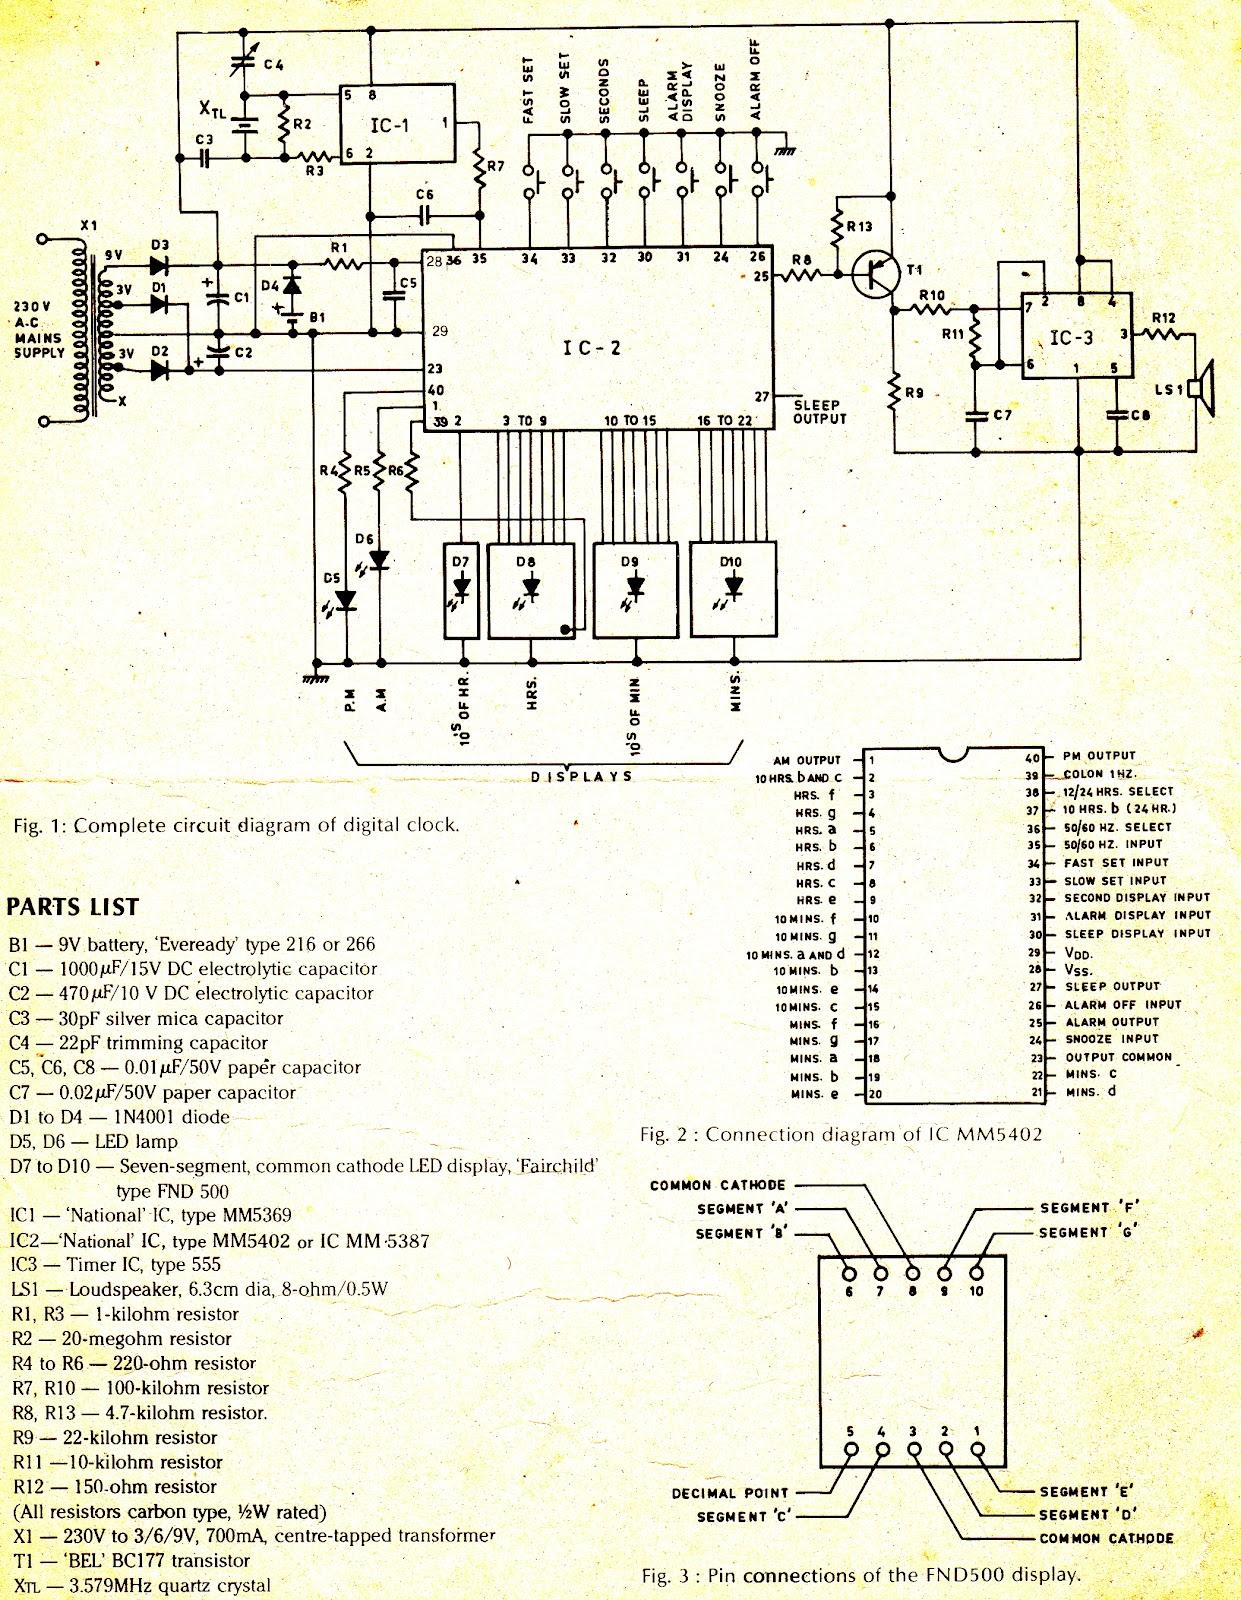 hight resolution of digital clock under repository circuits 24852 next gr led running light circuit diagram foto artis candydoll